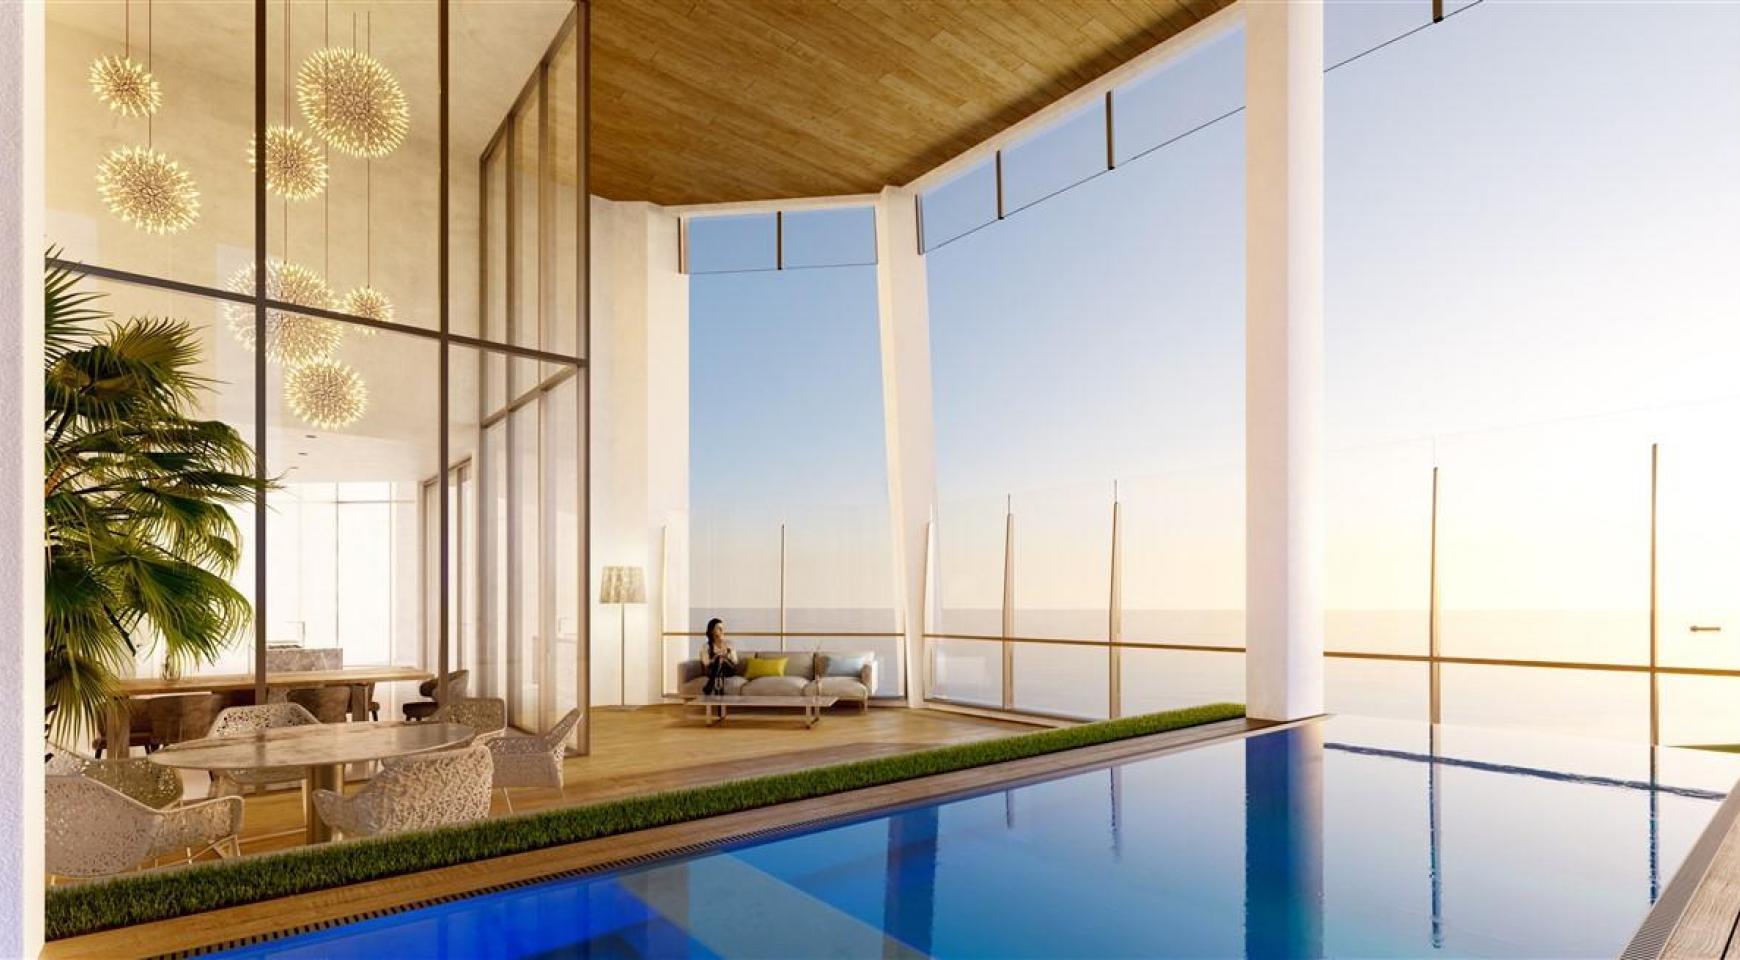 Sky Tower. Μοντέρνο ευρύχωρο διαμέρισμα ενός υπνοδωματίου με θέα στην θάλασσα - 1